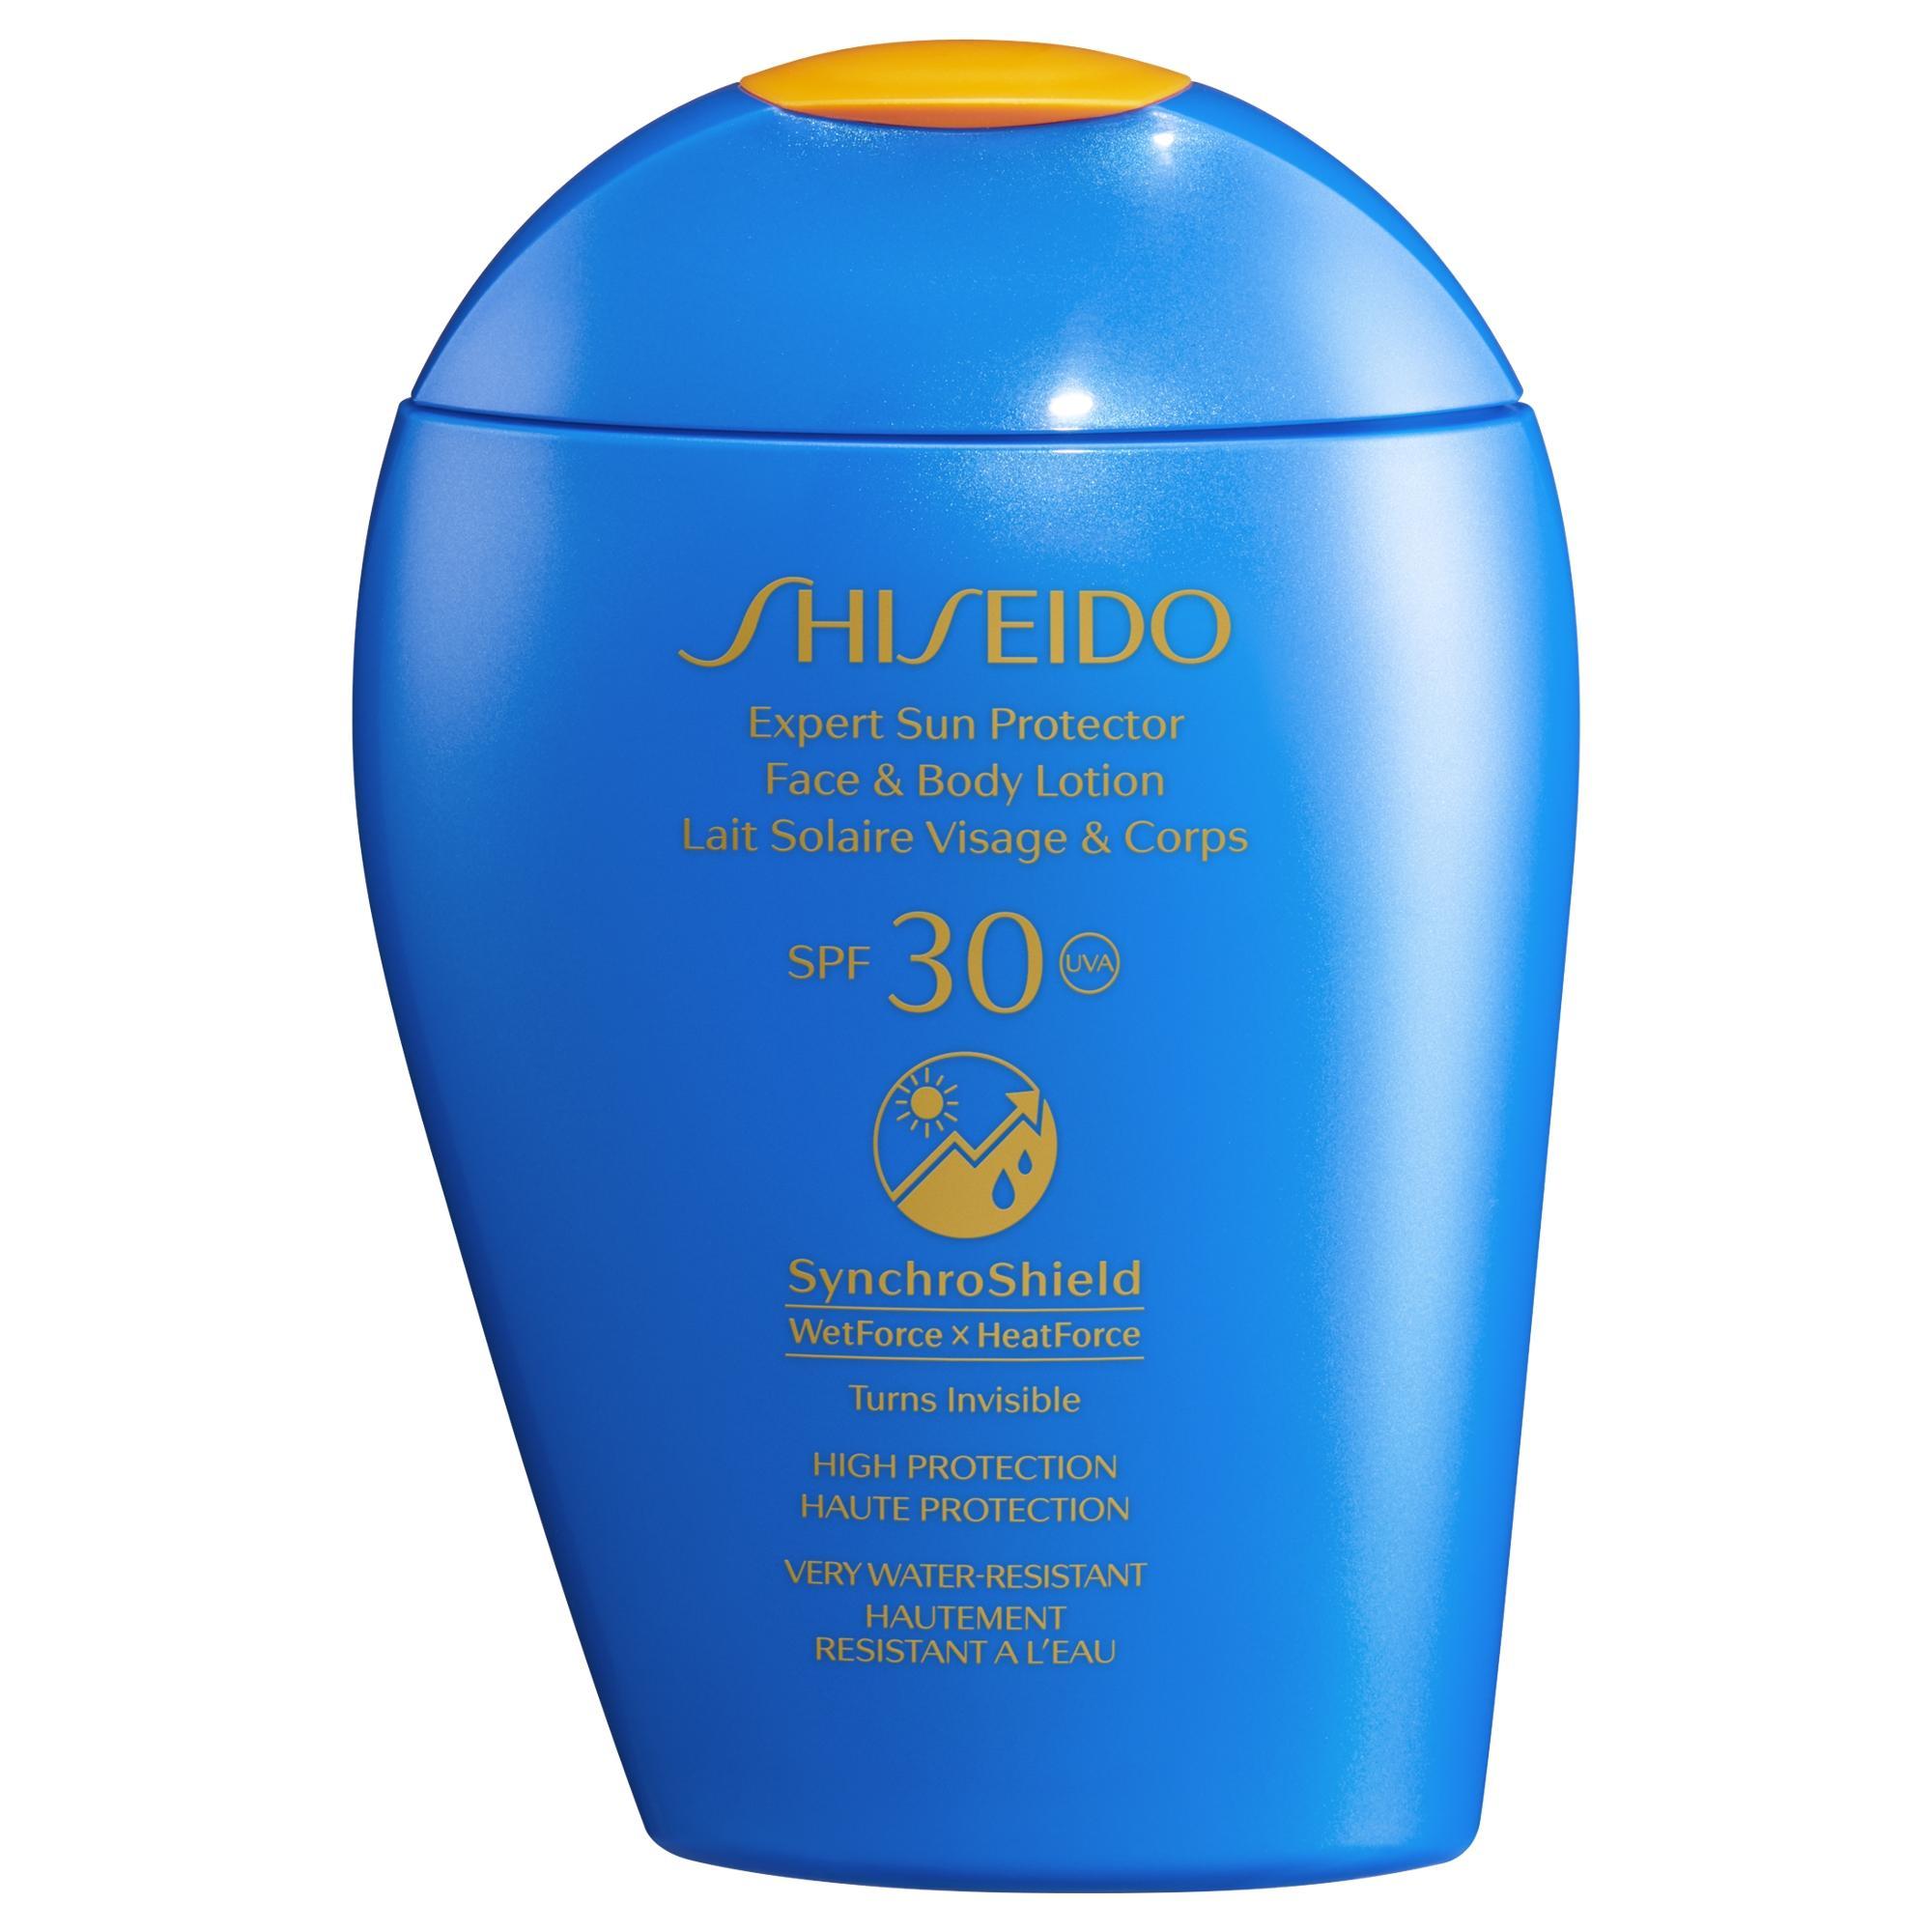 Shiseido Expert Sun Protector Body Lotion SPF 30  150 ml